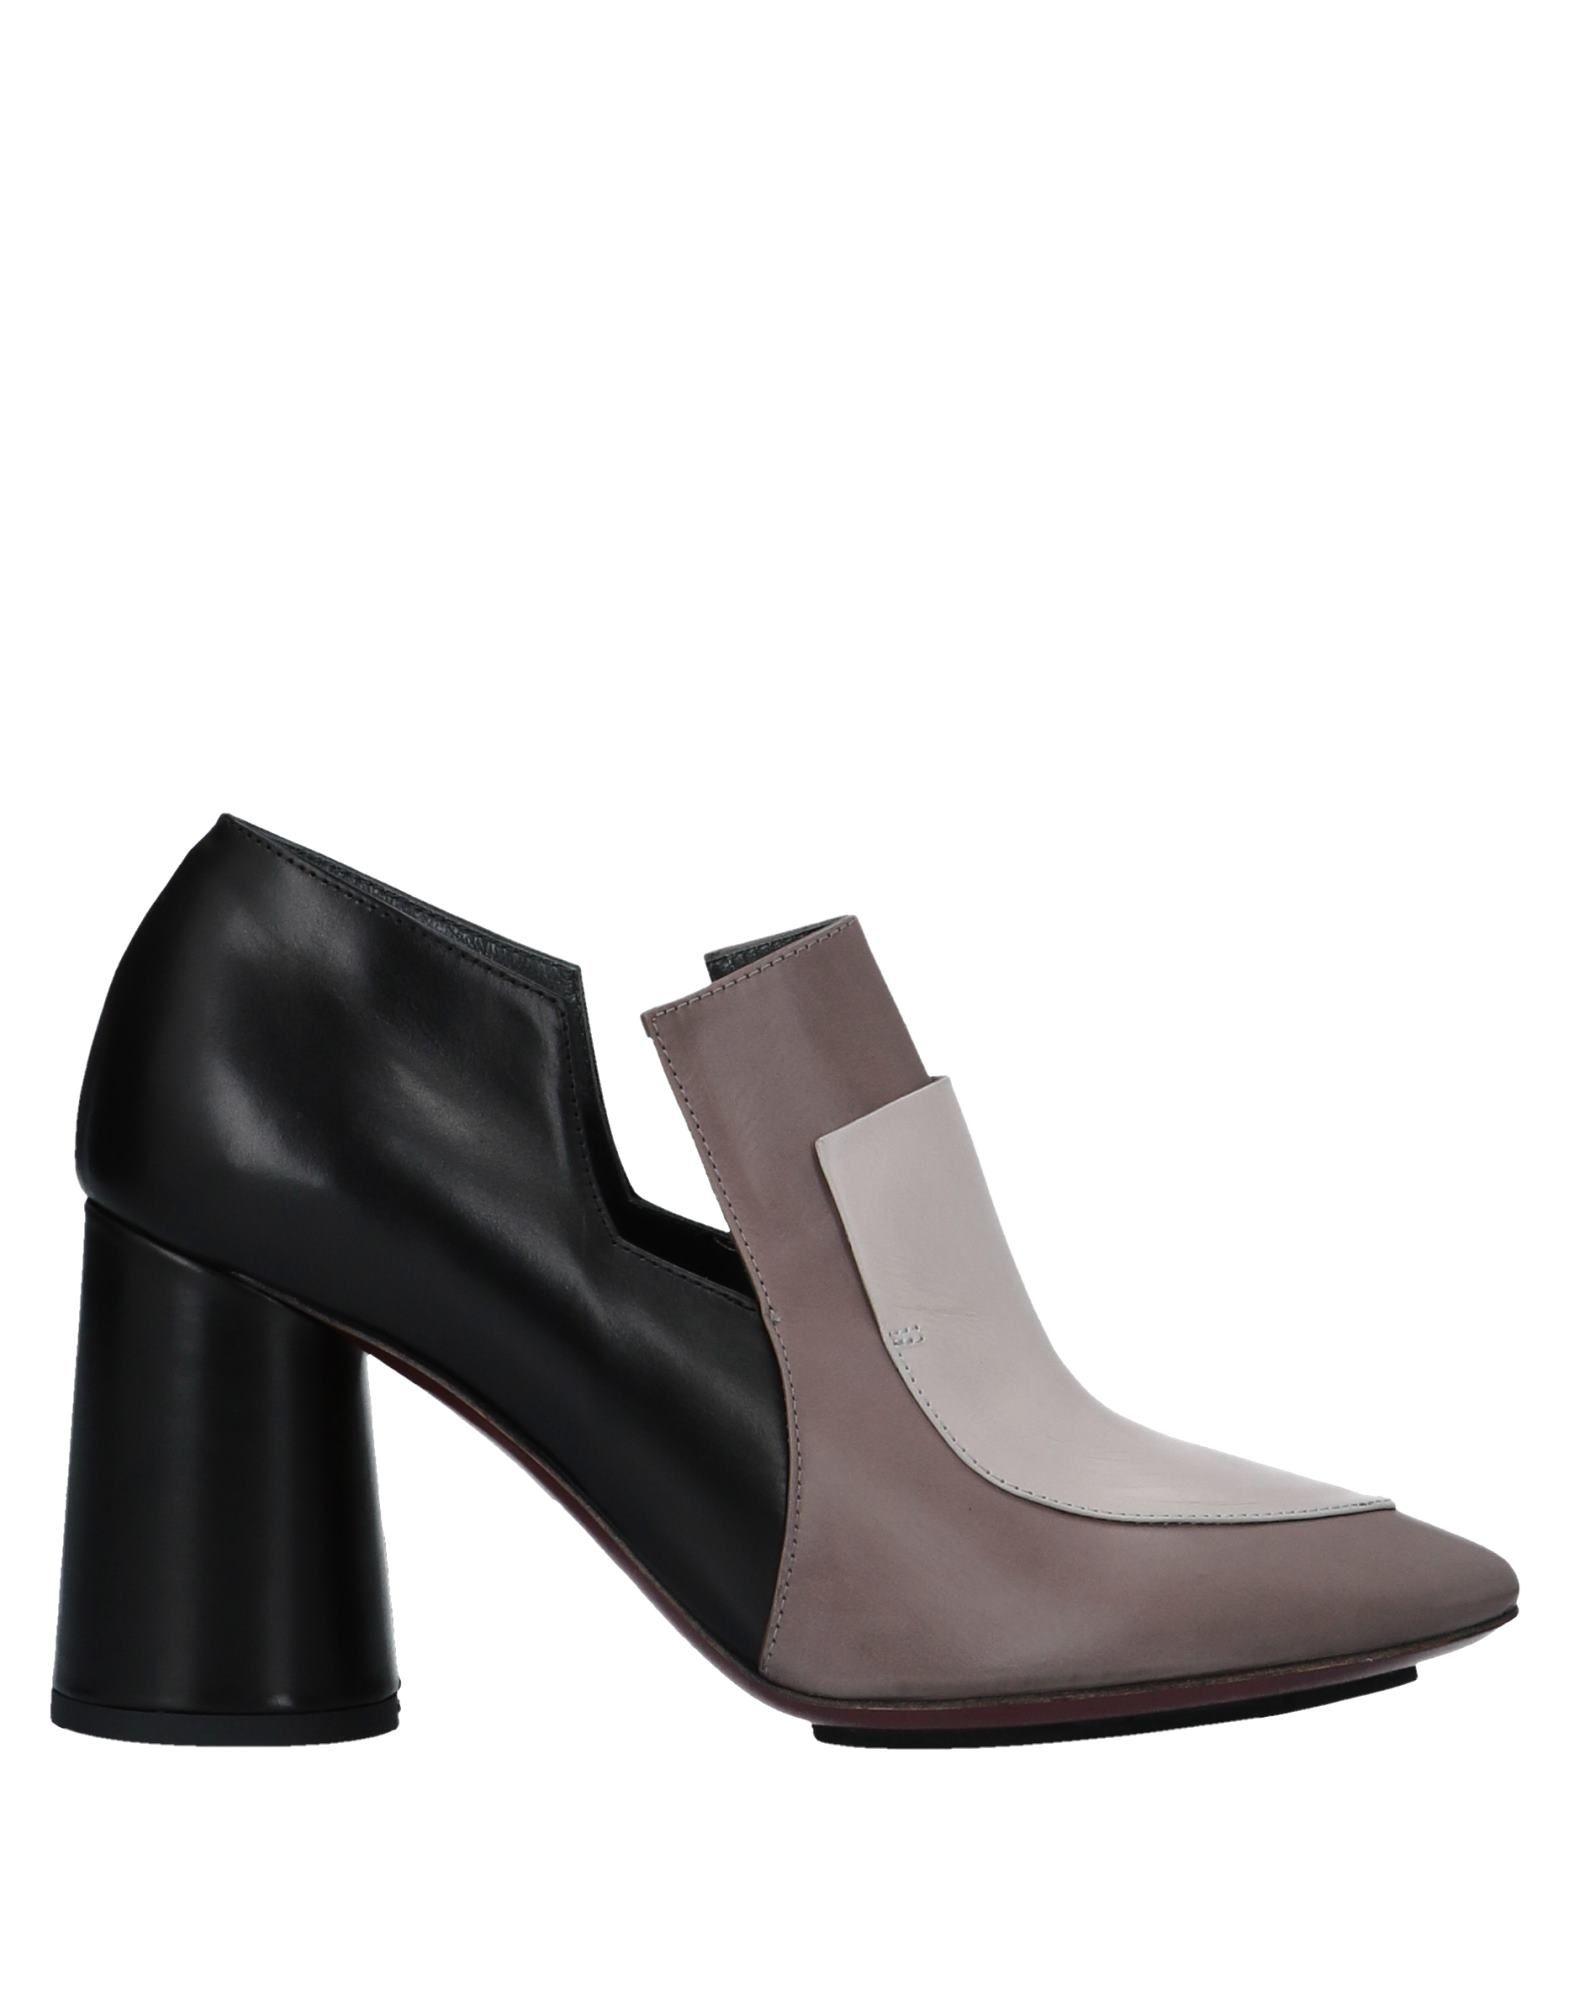 Rabatt Schuhe Stiefelette Ixos Stiefelette Schuhe Damen 11544769IJ c5c935